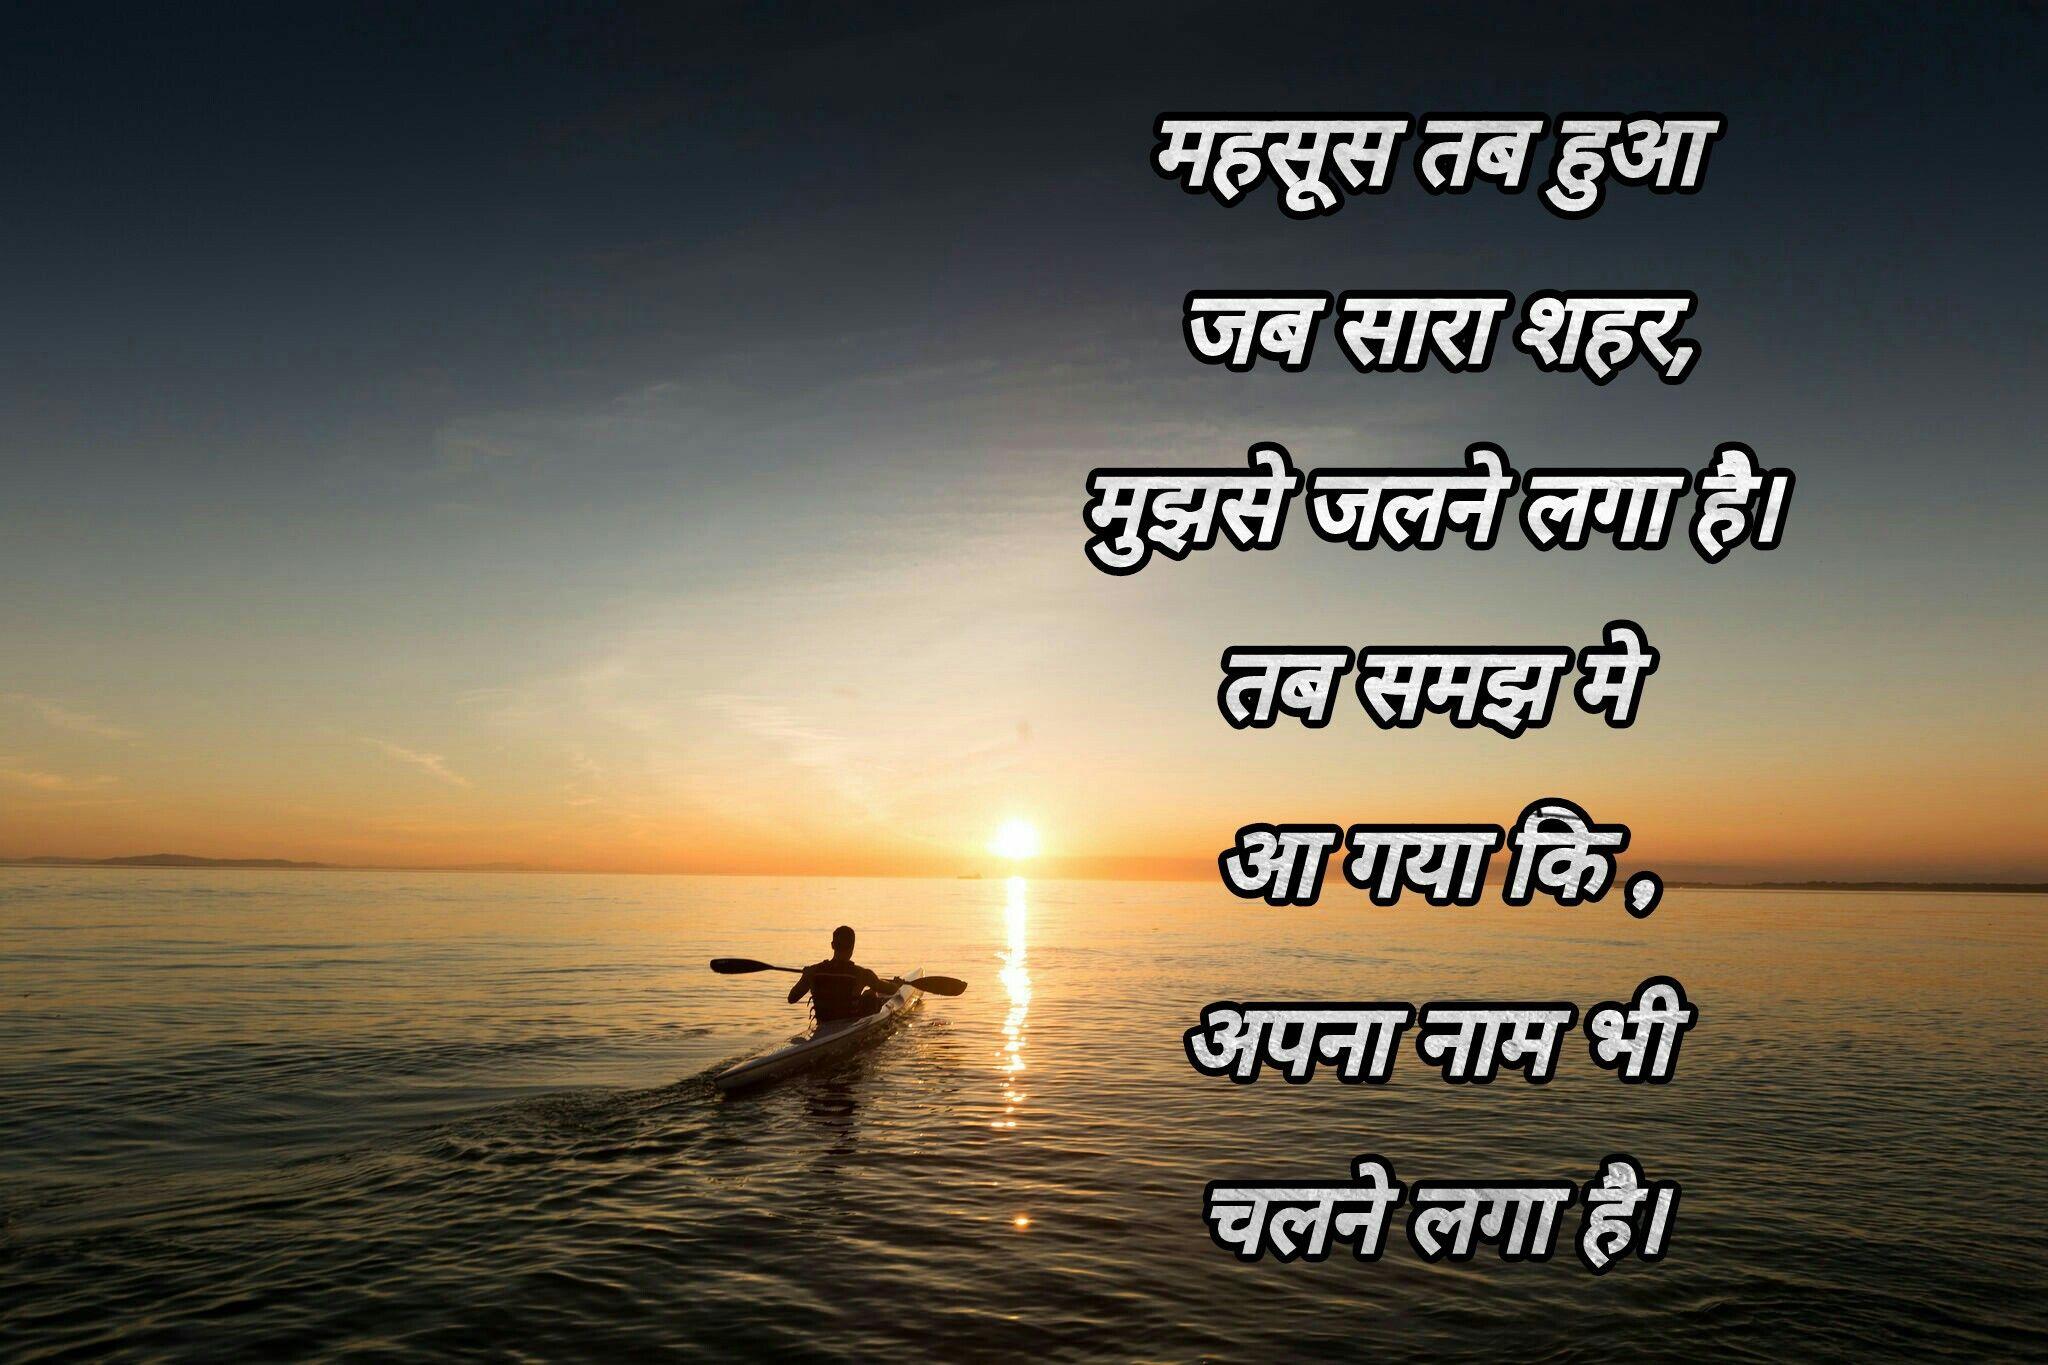 Quotes Famous Hindi Urdu Shayari Name Quotes Quotes Drake